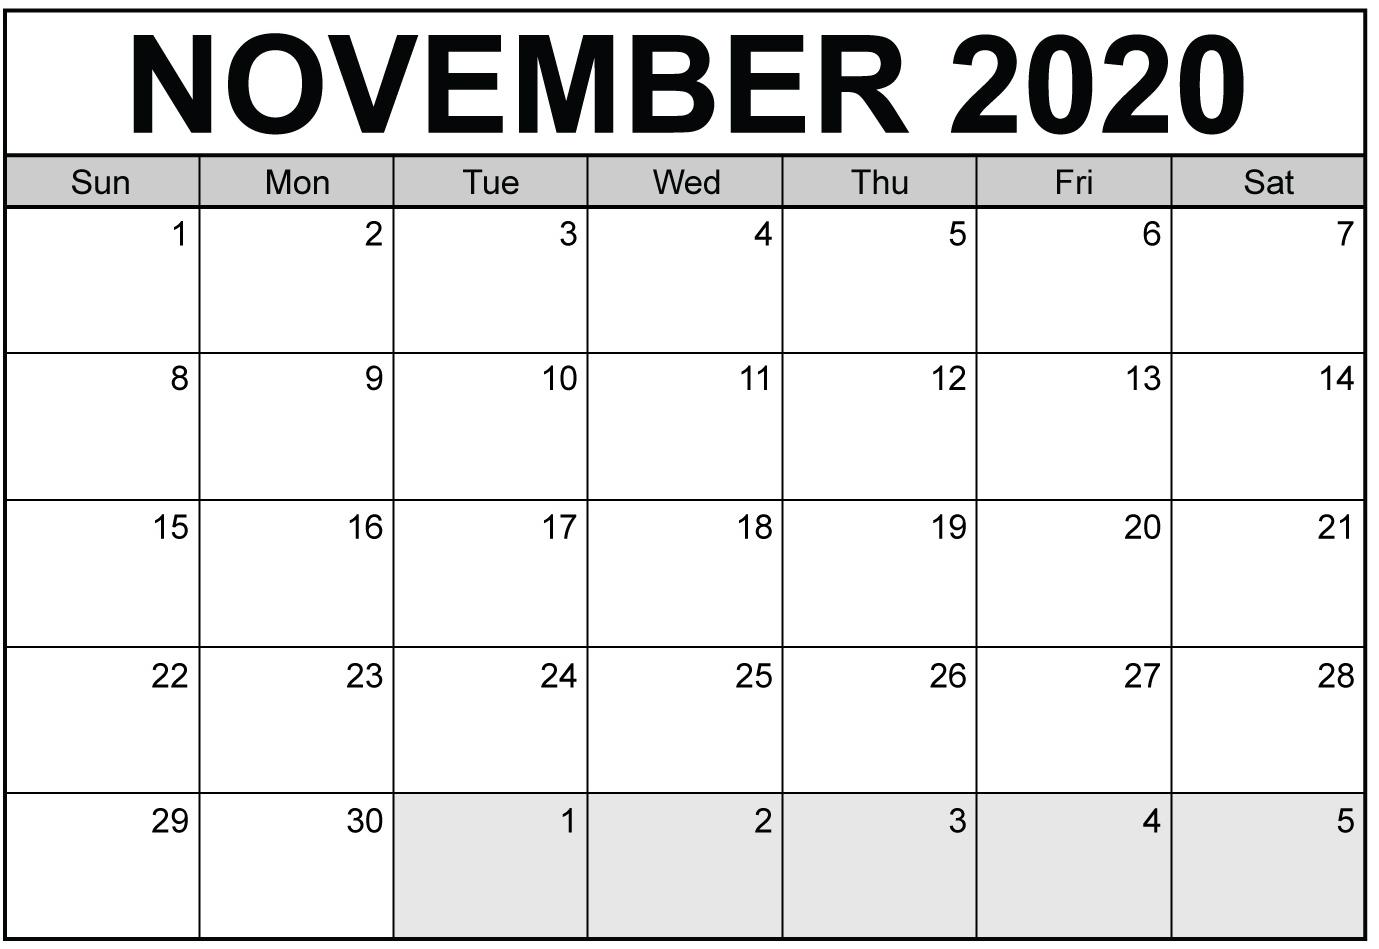 Free Printable November 2020 Calendar With Blank Notes - Set pertaining to 2020 Calendar Free Printable With Space To Write